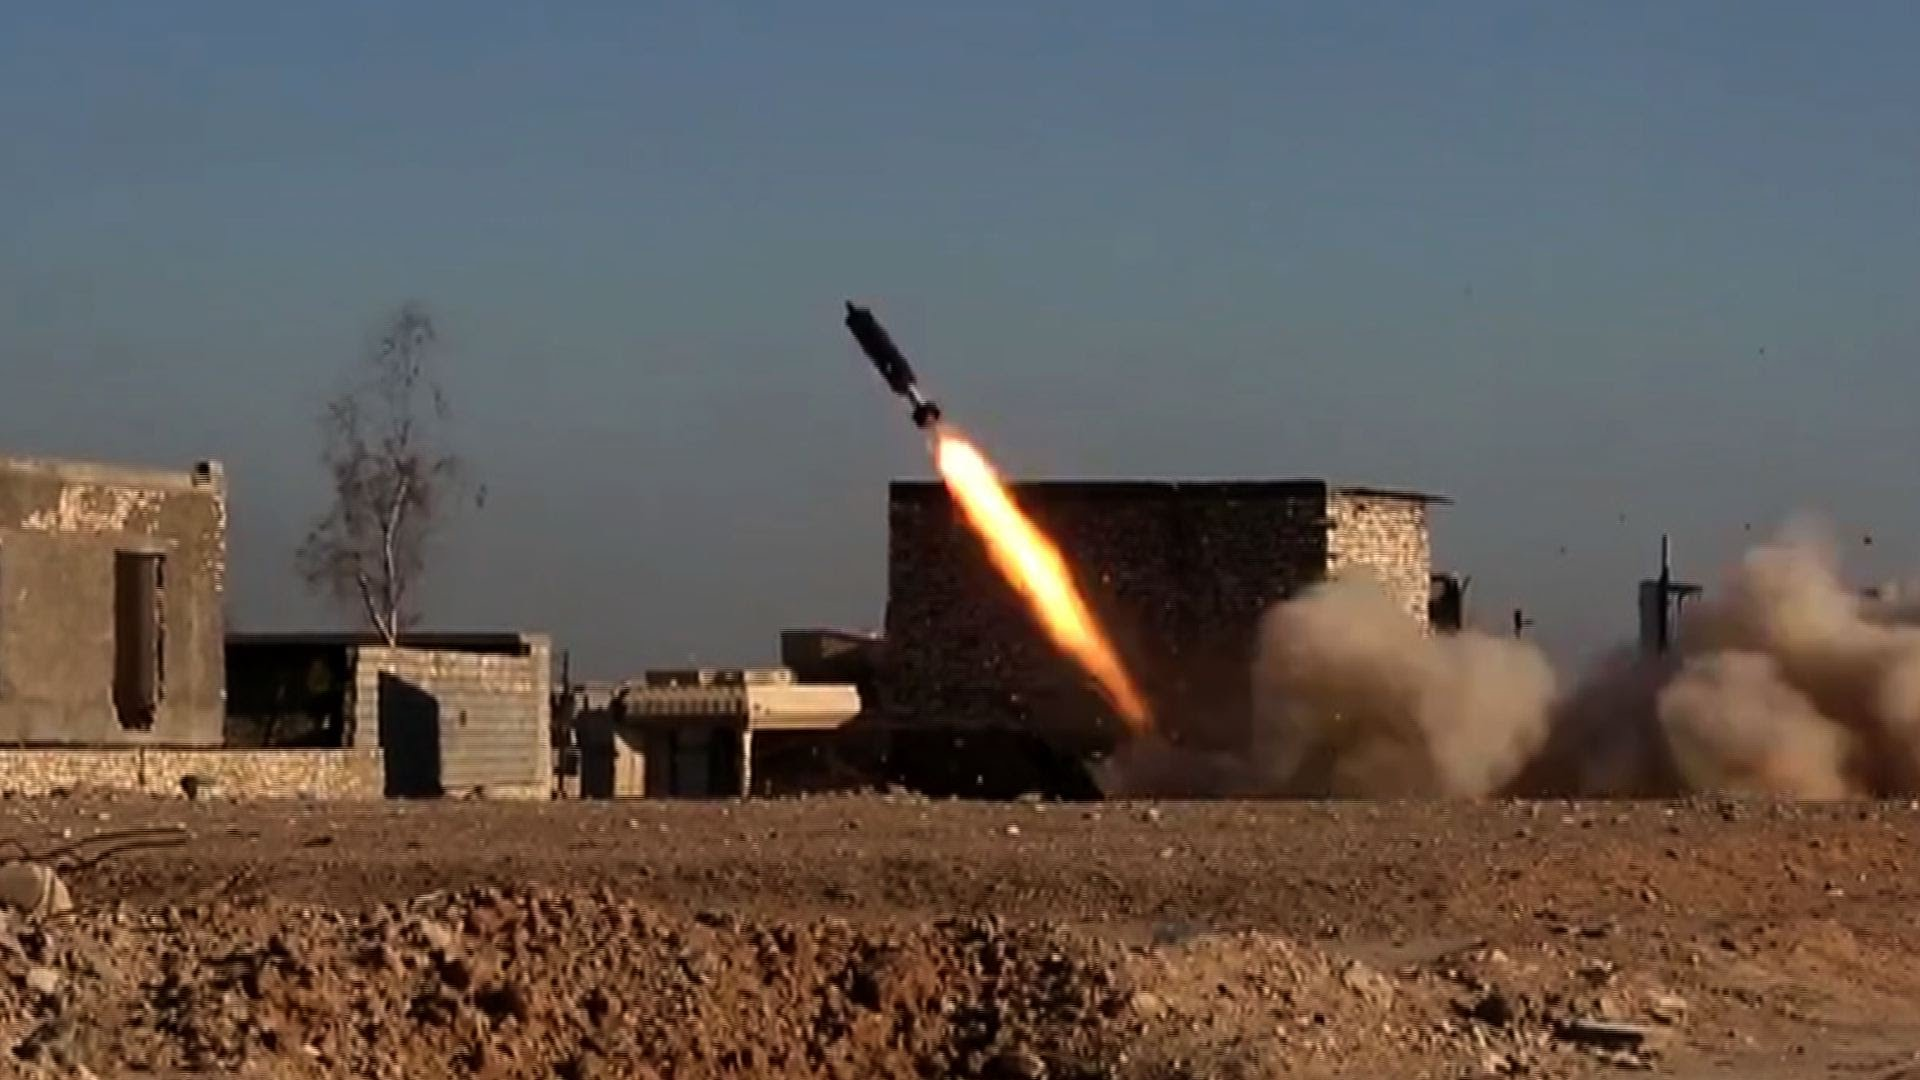 VIDEO: VELIKI USPJEH U BORBI PROTIV DŽIHADISTA Iračke snage preotele IS-u velik dio Ramadija